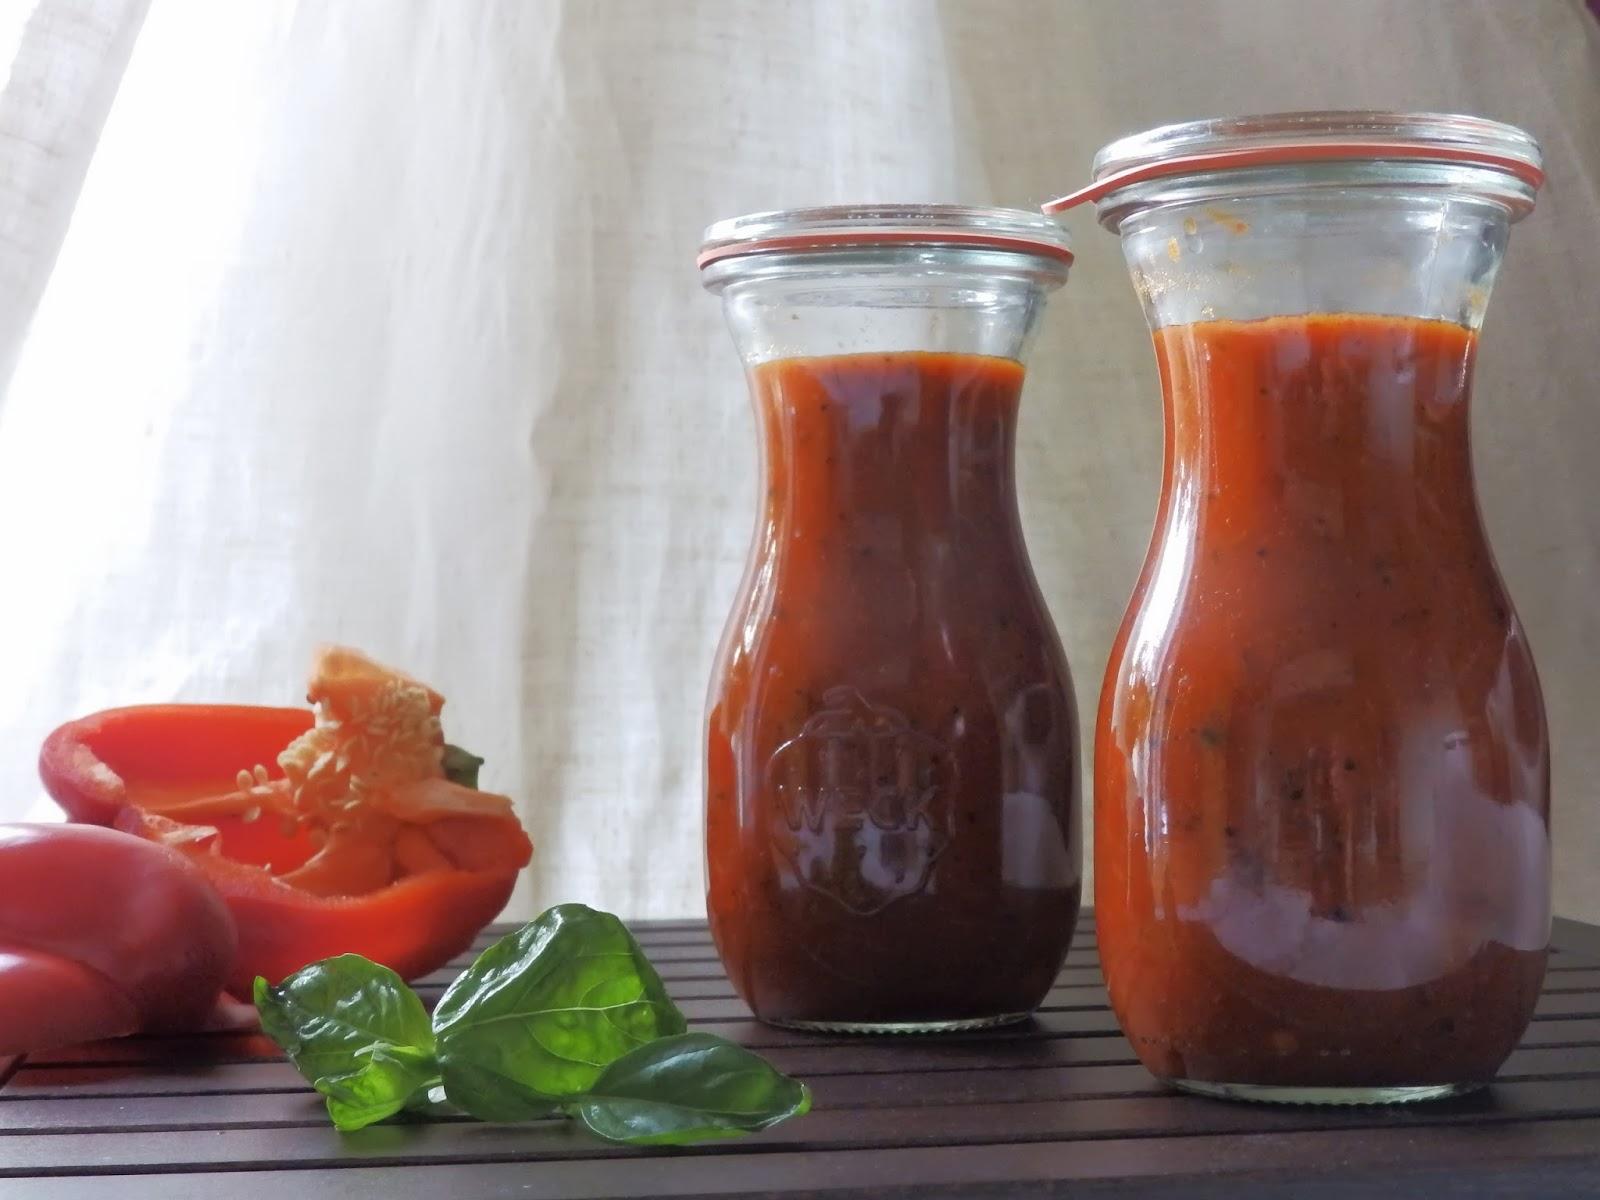 paprika ketchup und zucchini machen nudeln mit ketchup salonf hig lifestyle in gr n. Black Bedroom Furniture Sets. Home Design Ideas